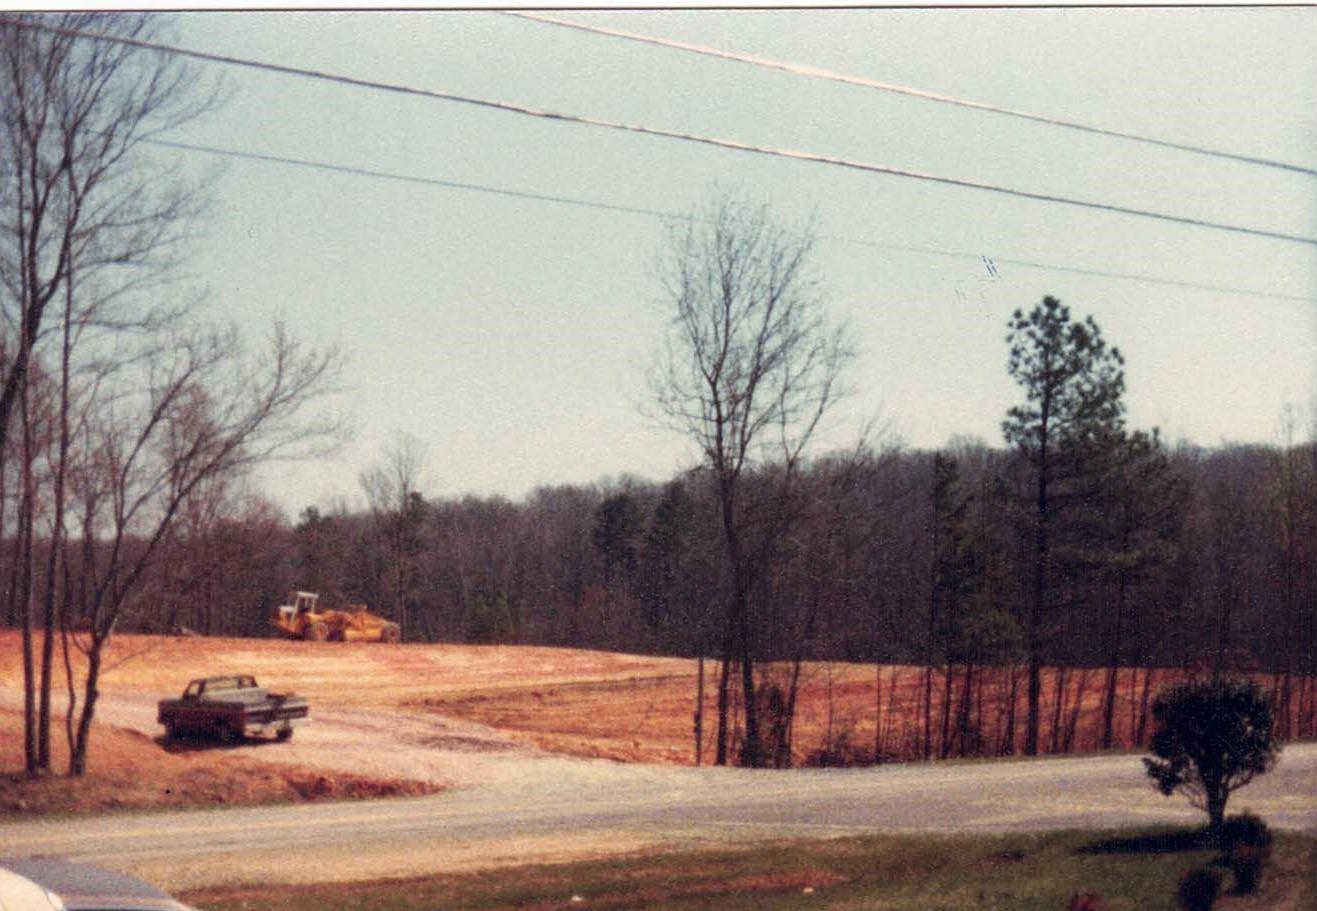 Grading for lower site 1984